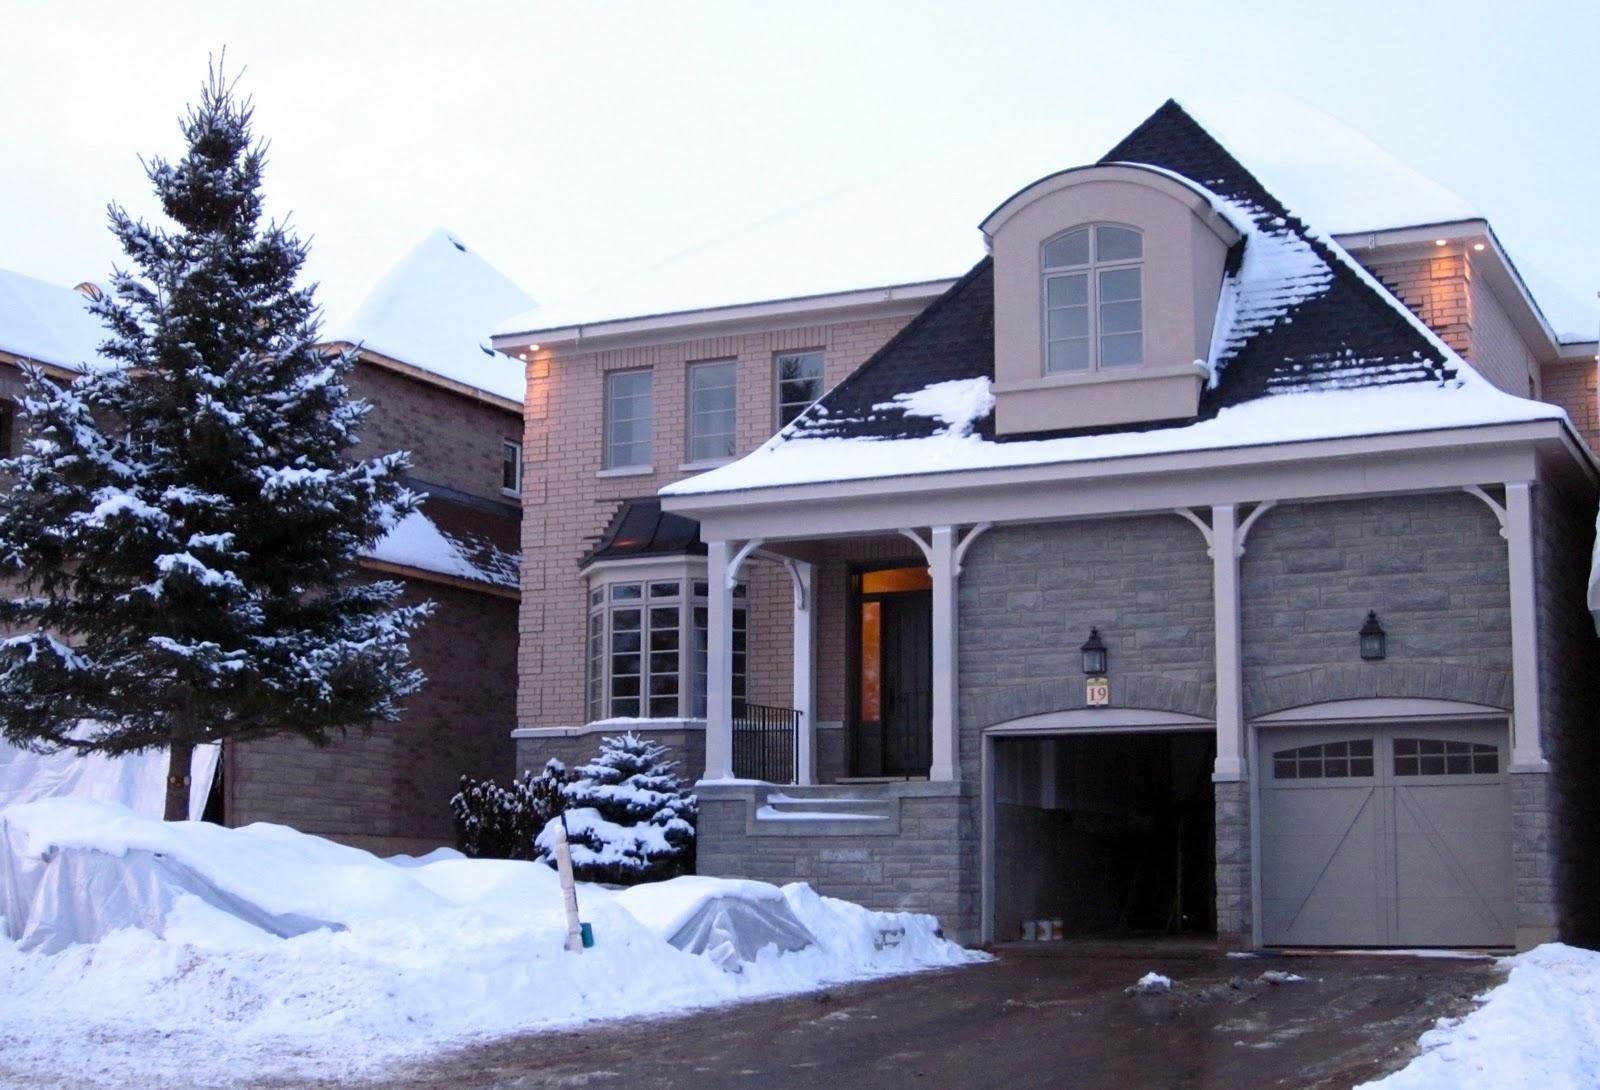 My visit to sarah richardson s new house